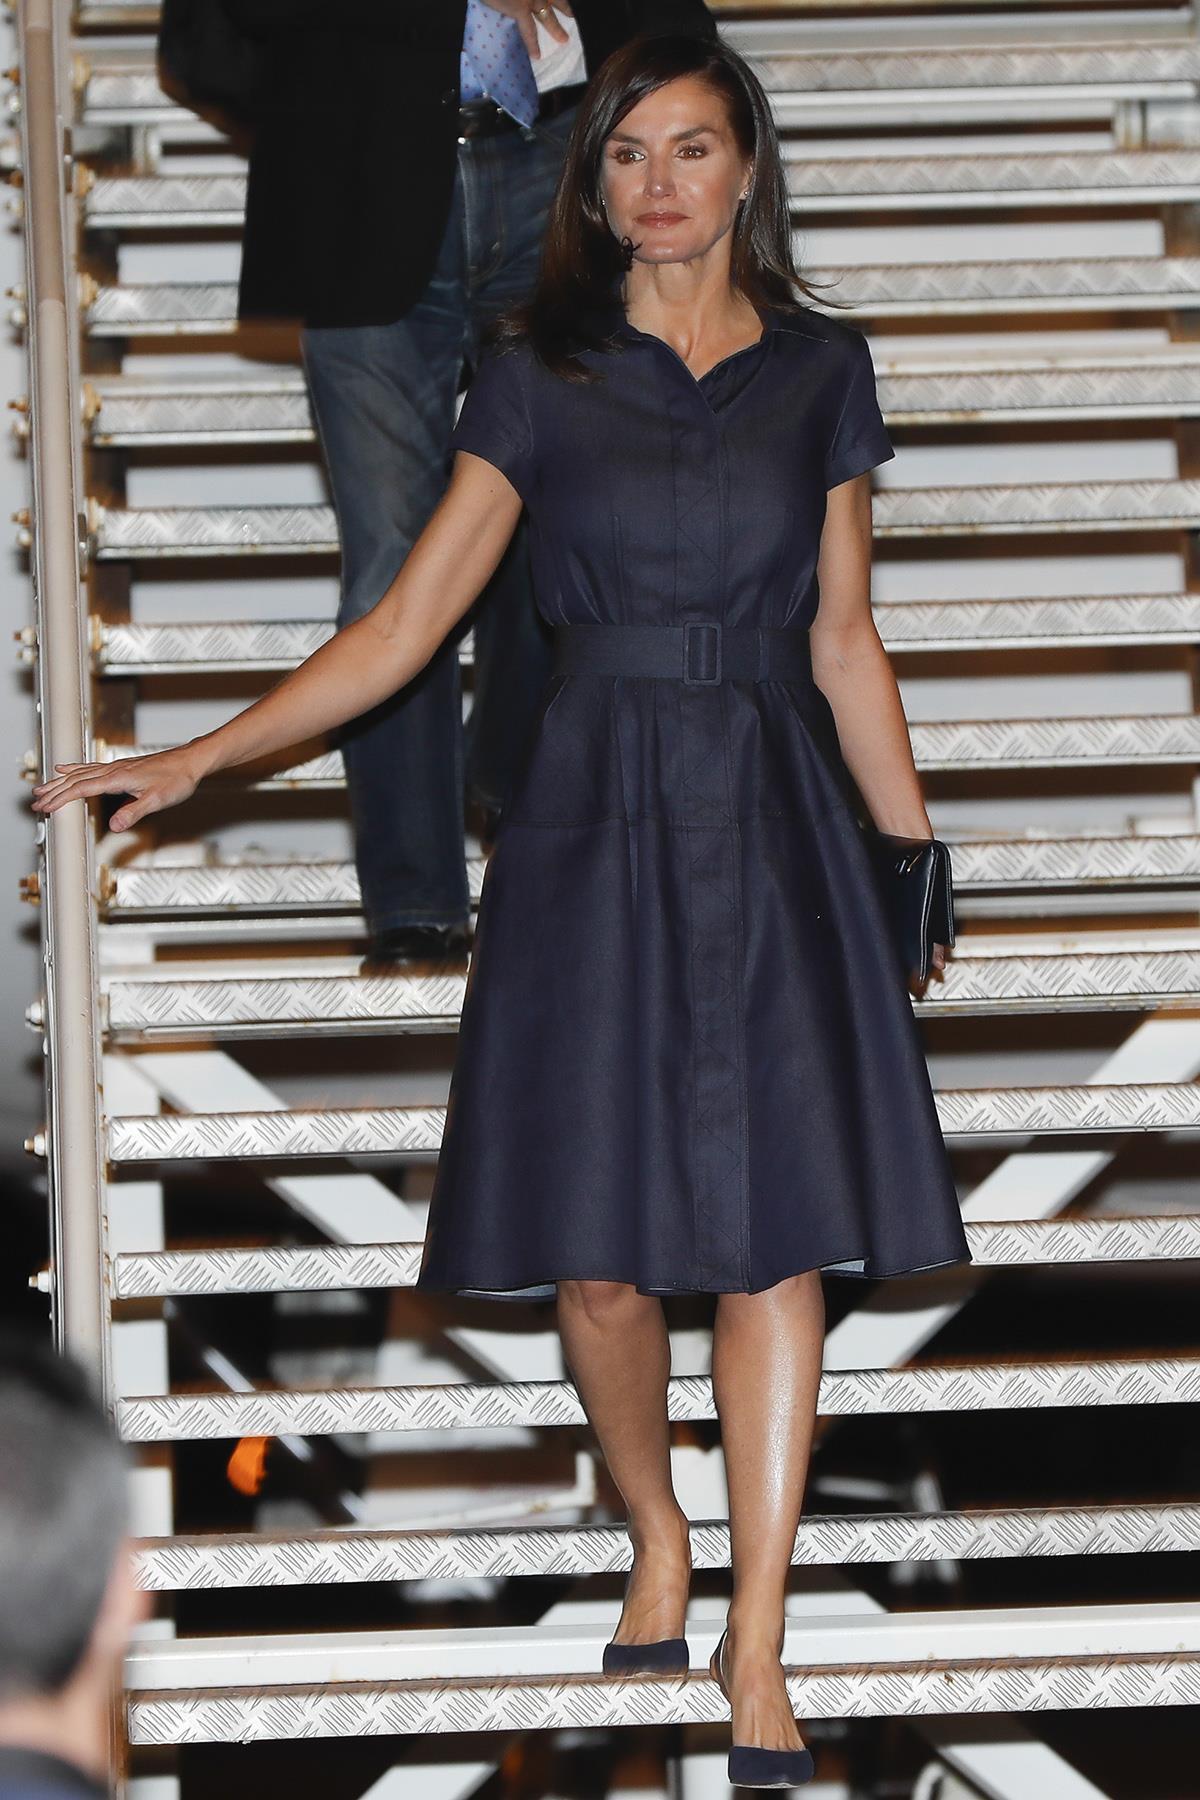 b7562ee5e reina-letizia-ortiz-vestido-camisero5. El vestido camisero de Letizia Ortiz